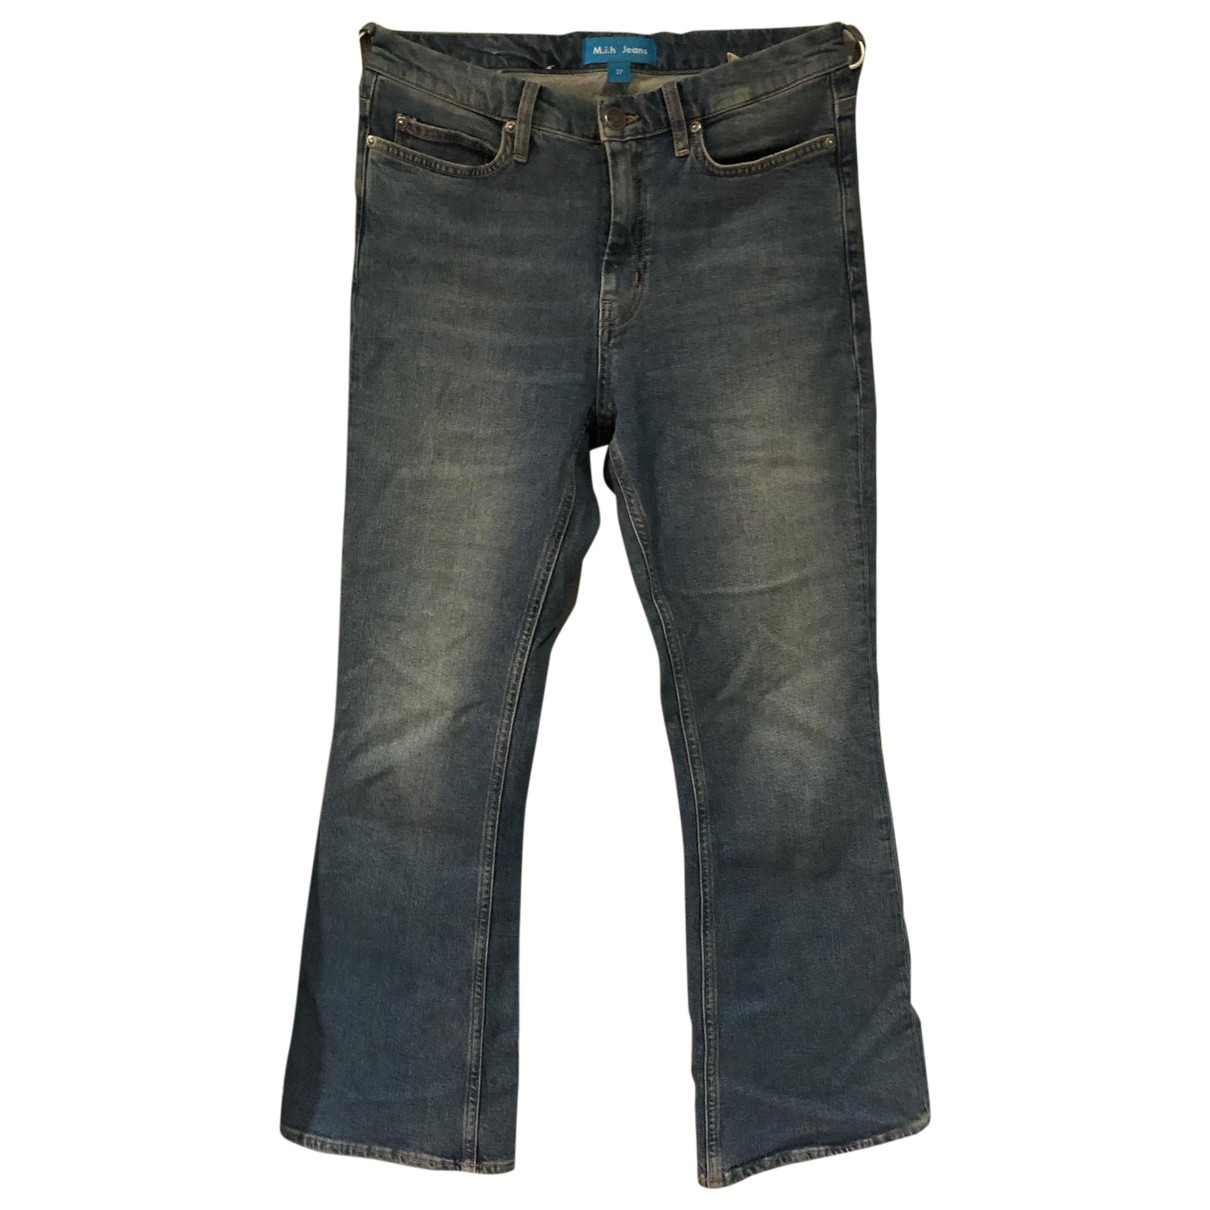 Mih Jeans \N Blue Denim - Jeans Jeans for Women 27 US